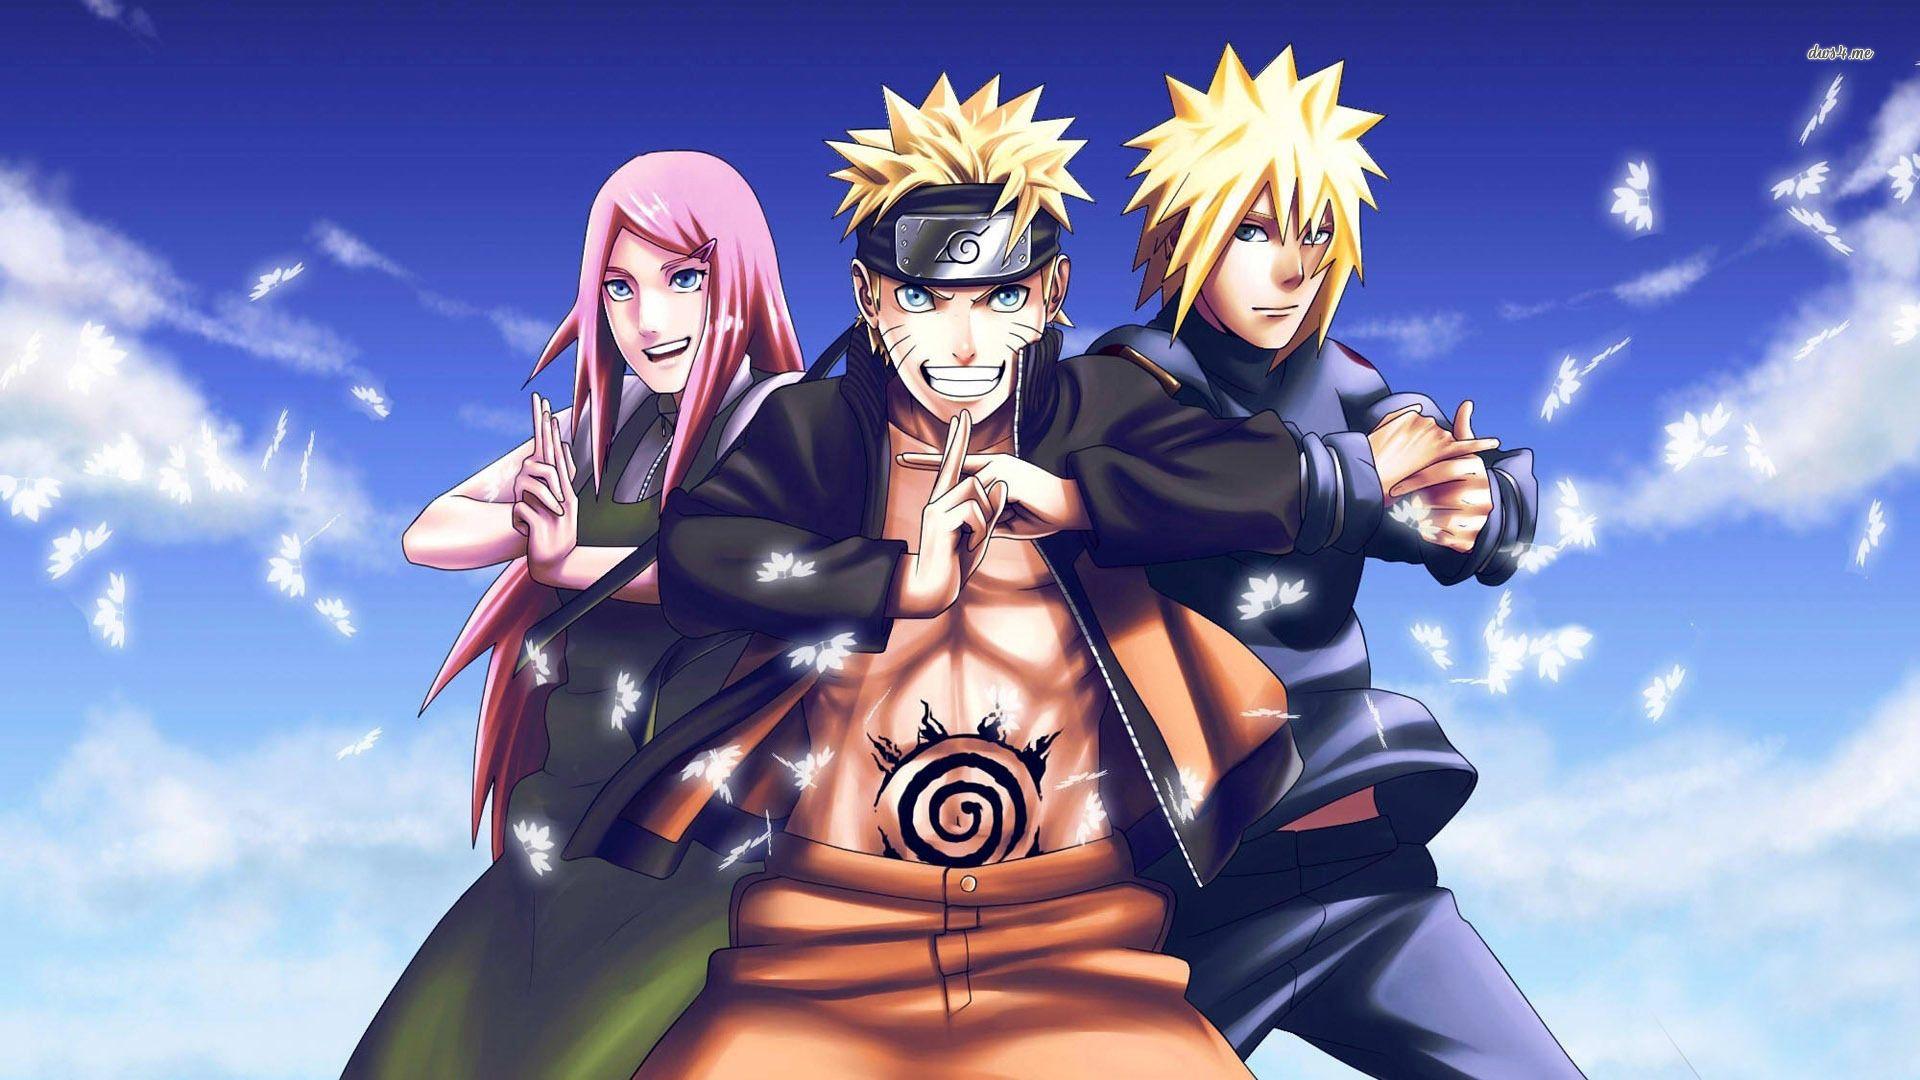 Great Wallpaper Naruto Anime - 89e33da667cda8b5fbfac11d39ae4d13  HD_75904.jpg